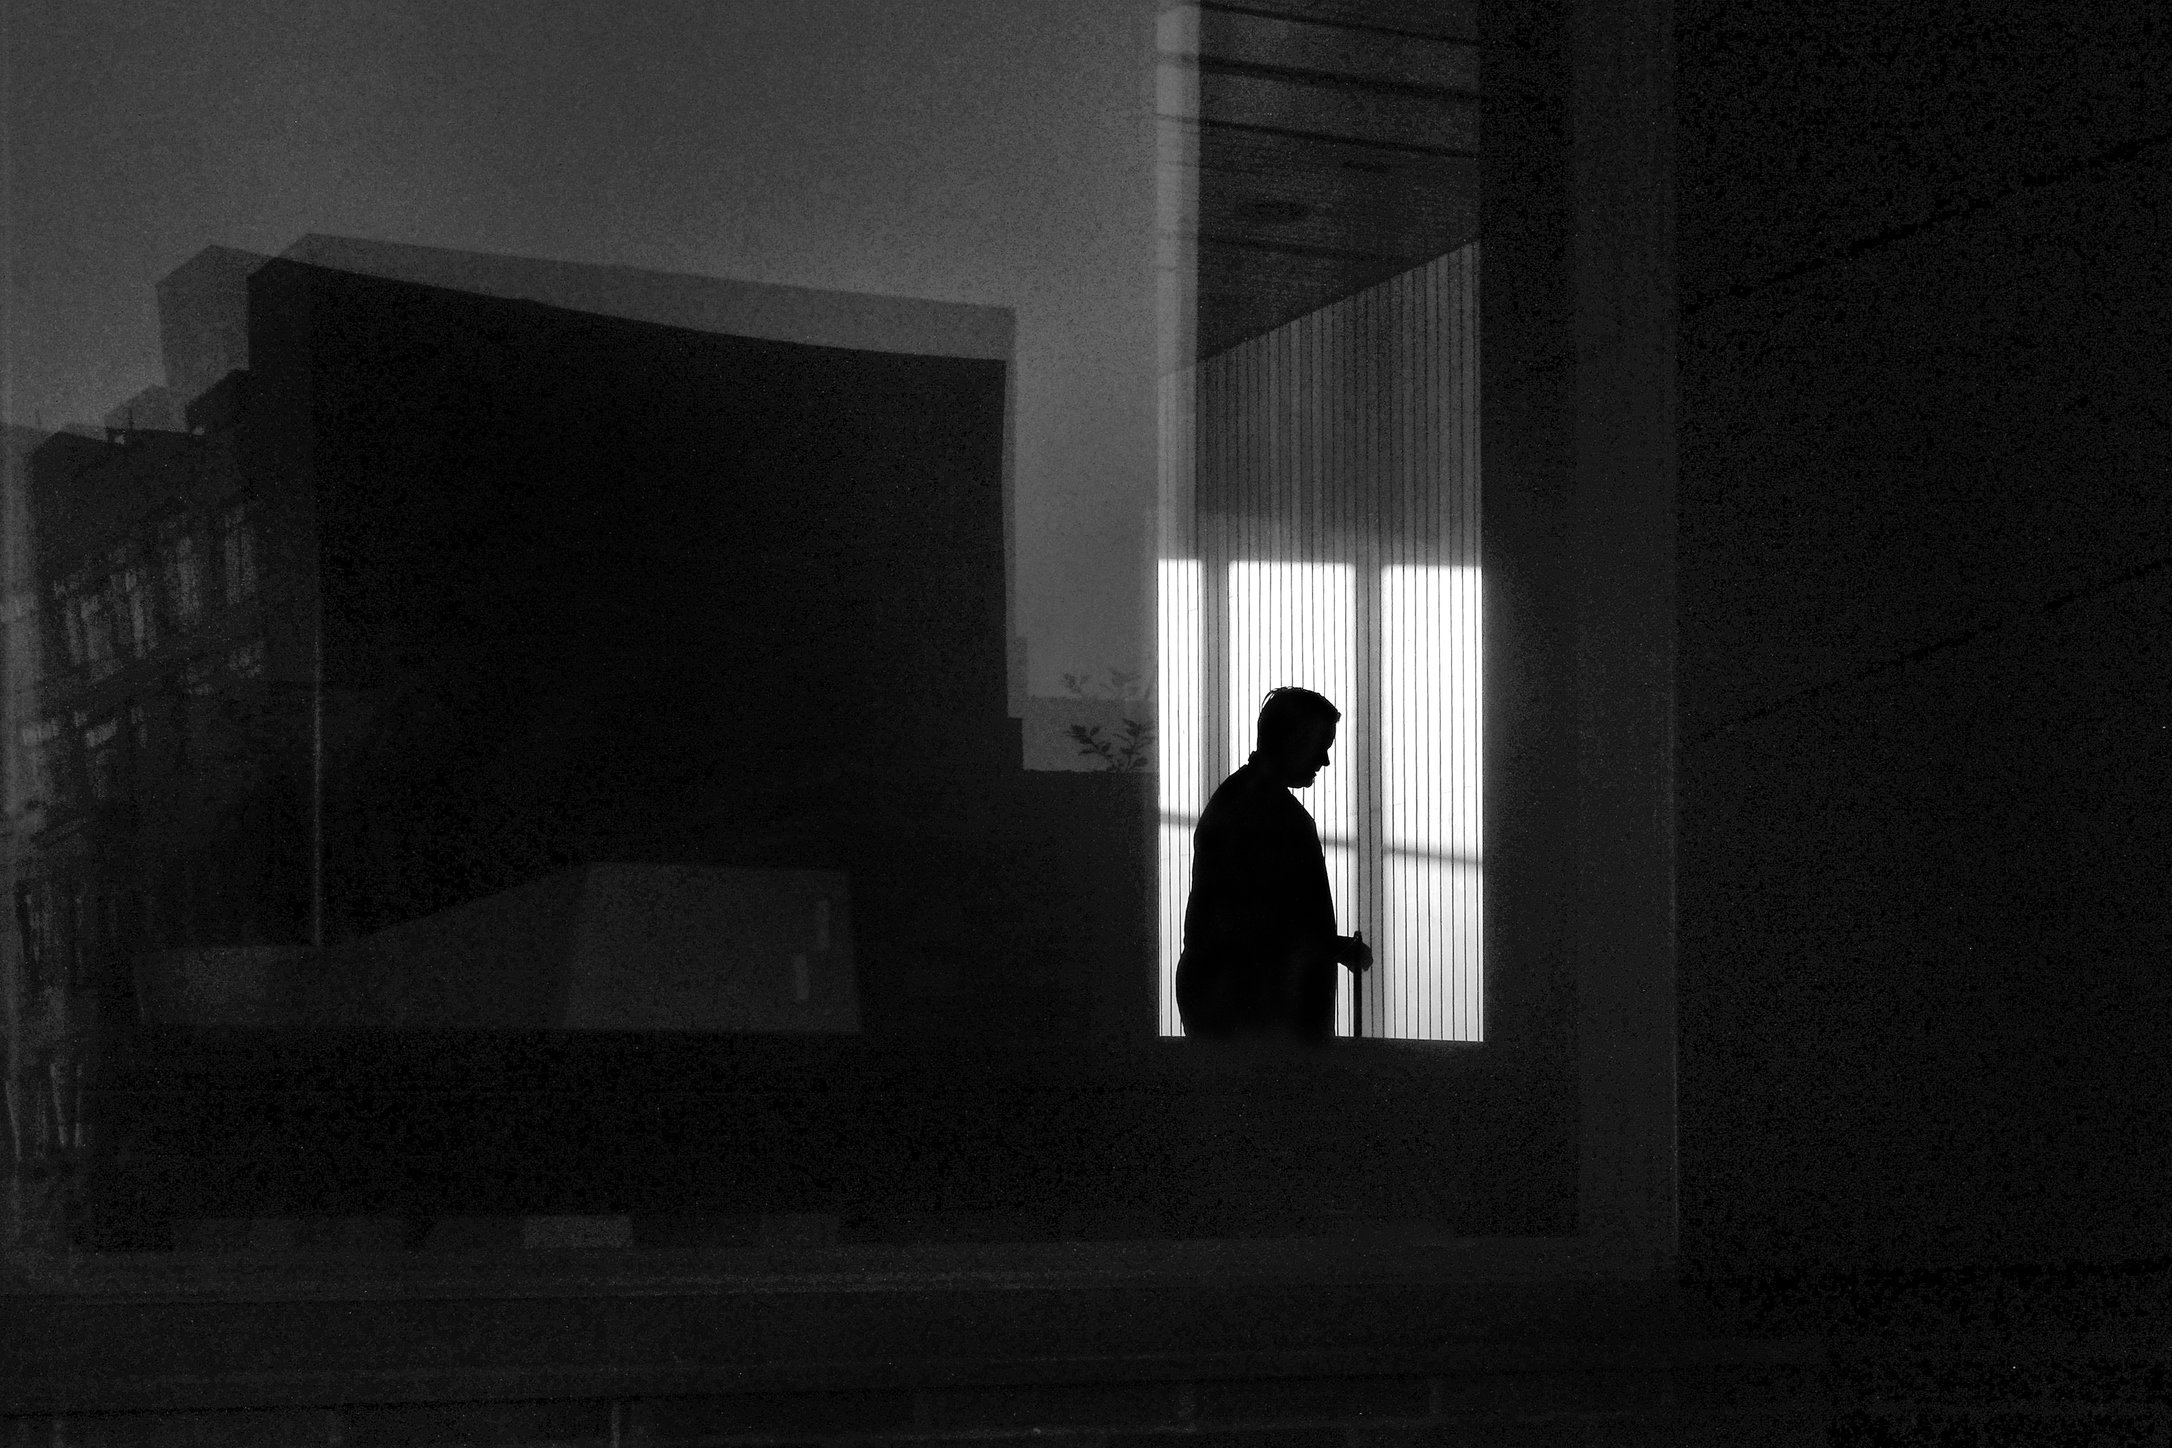 shadow-man.jpg